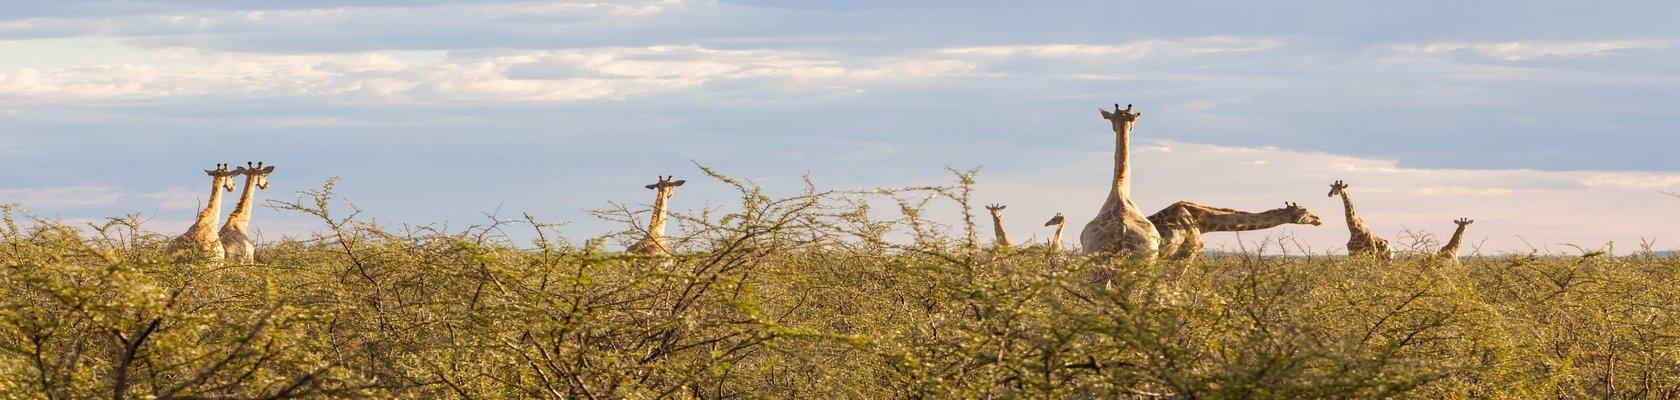 Op safari in Etosha Nationaal Park